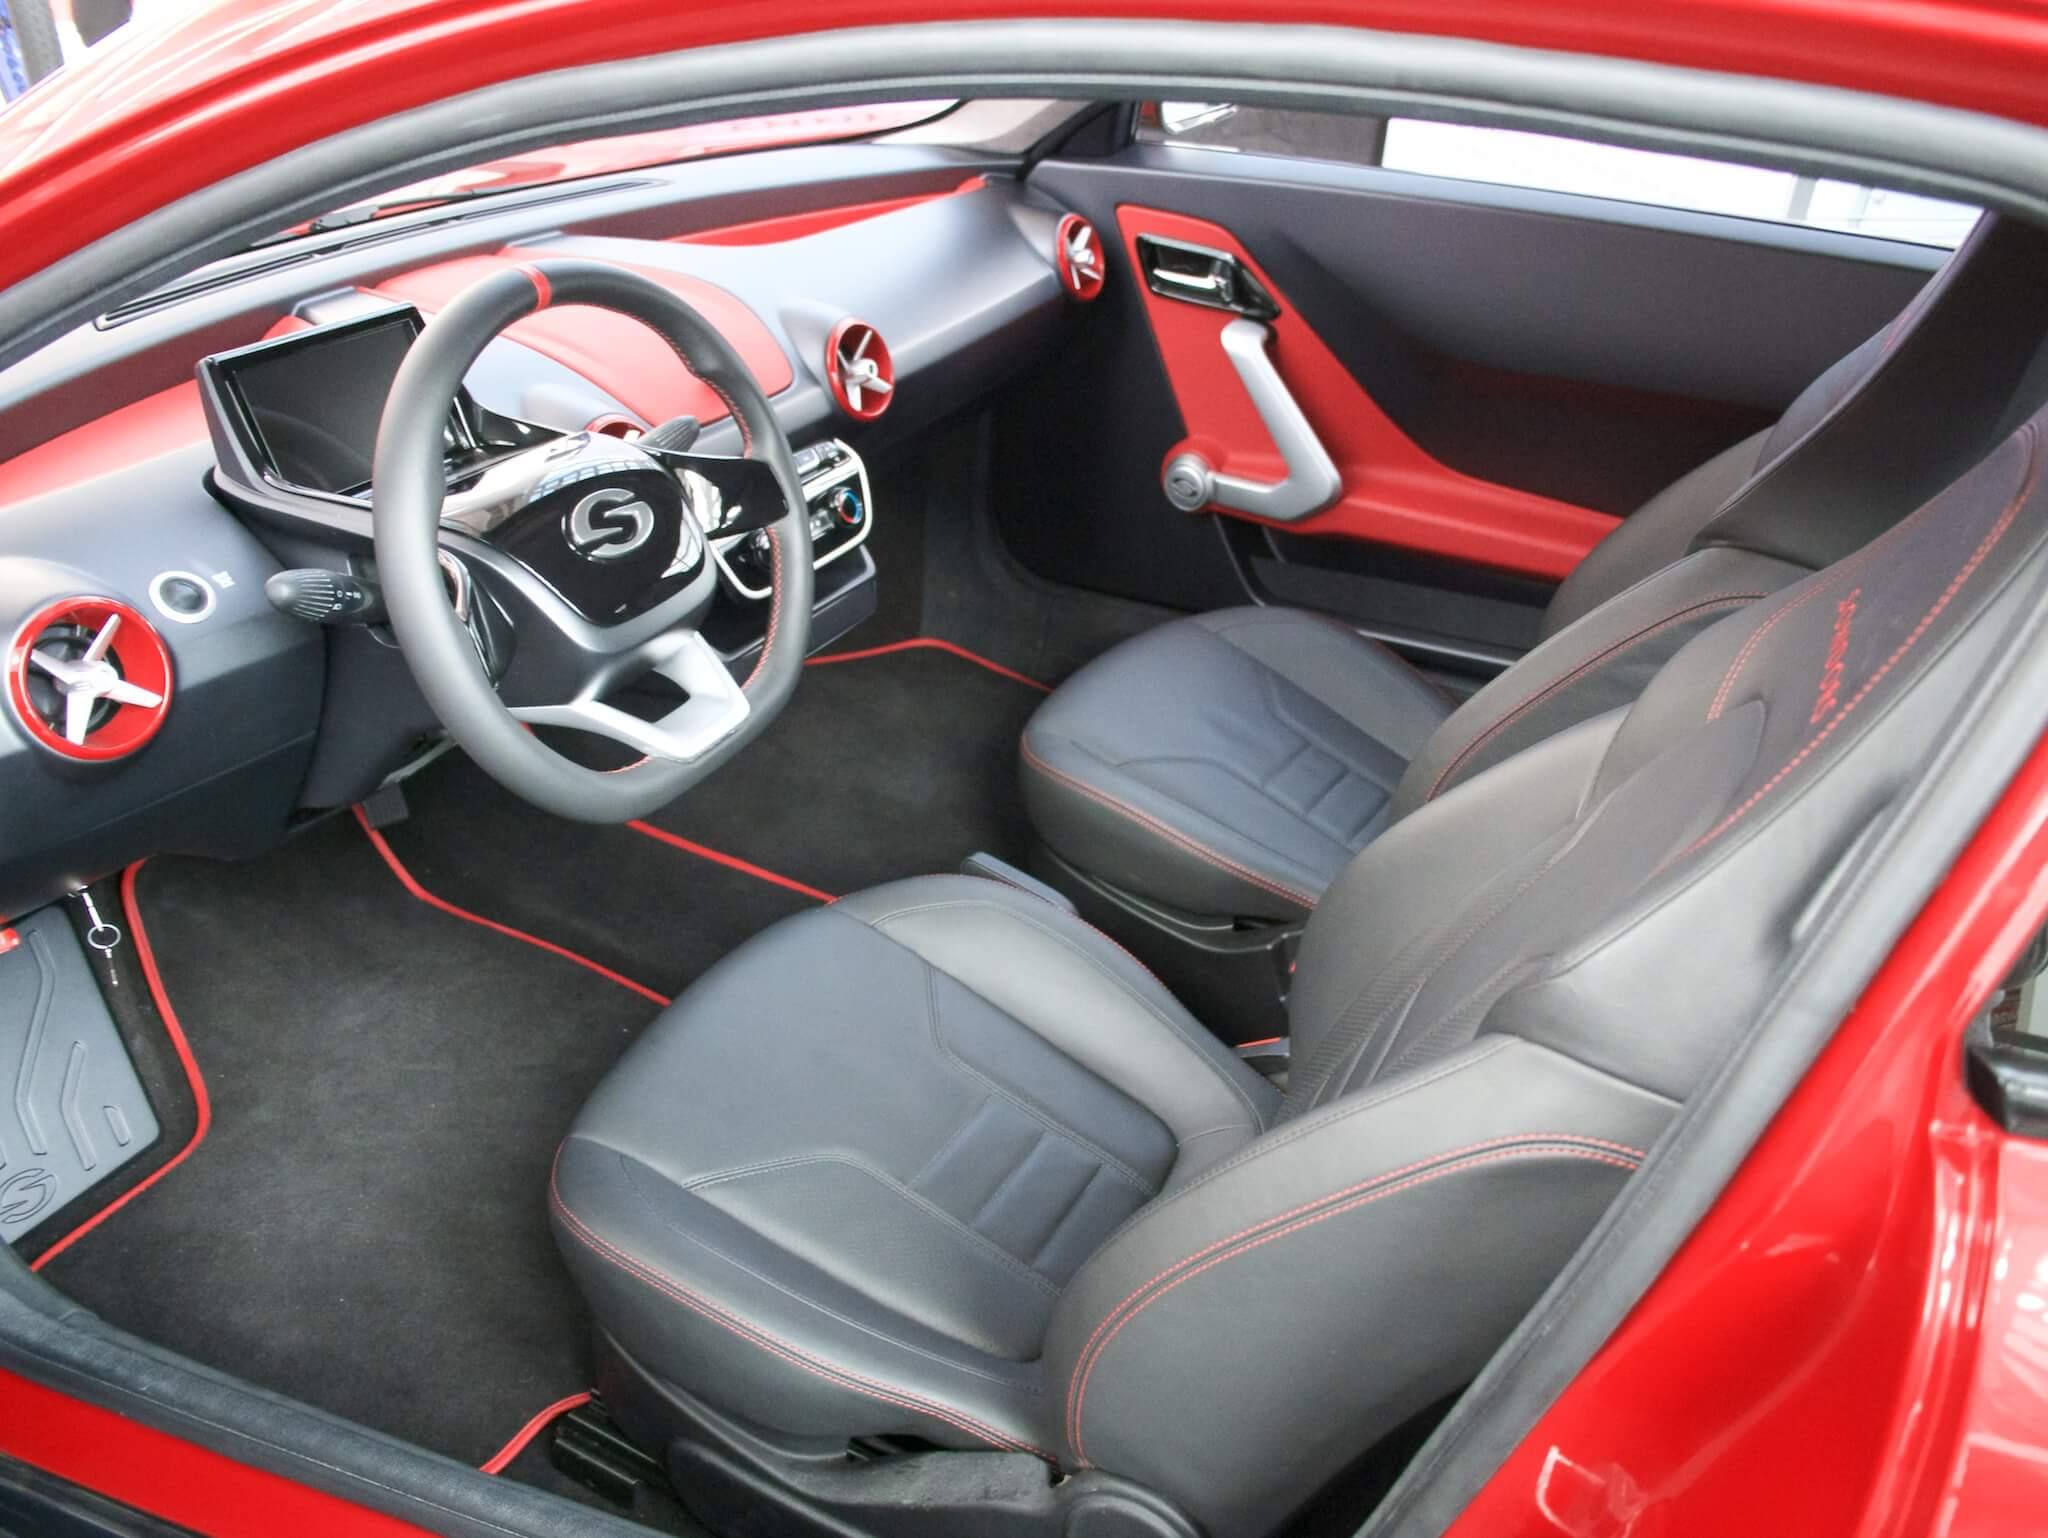 Салон трехколесного электромобиля Sondors